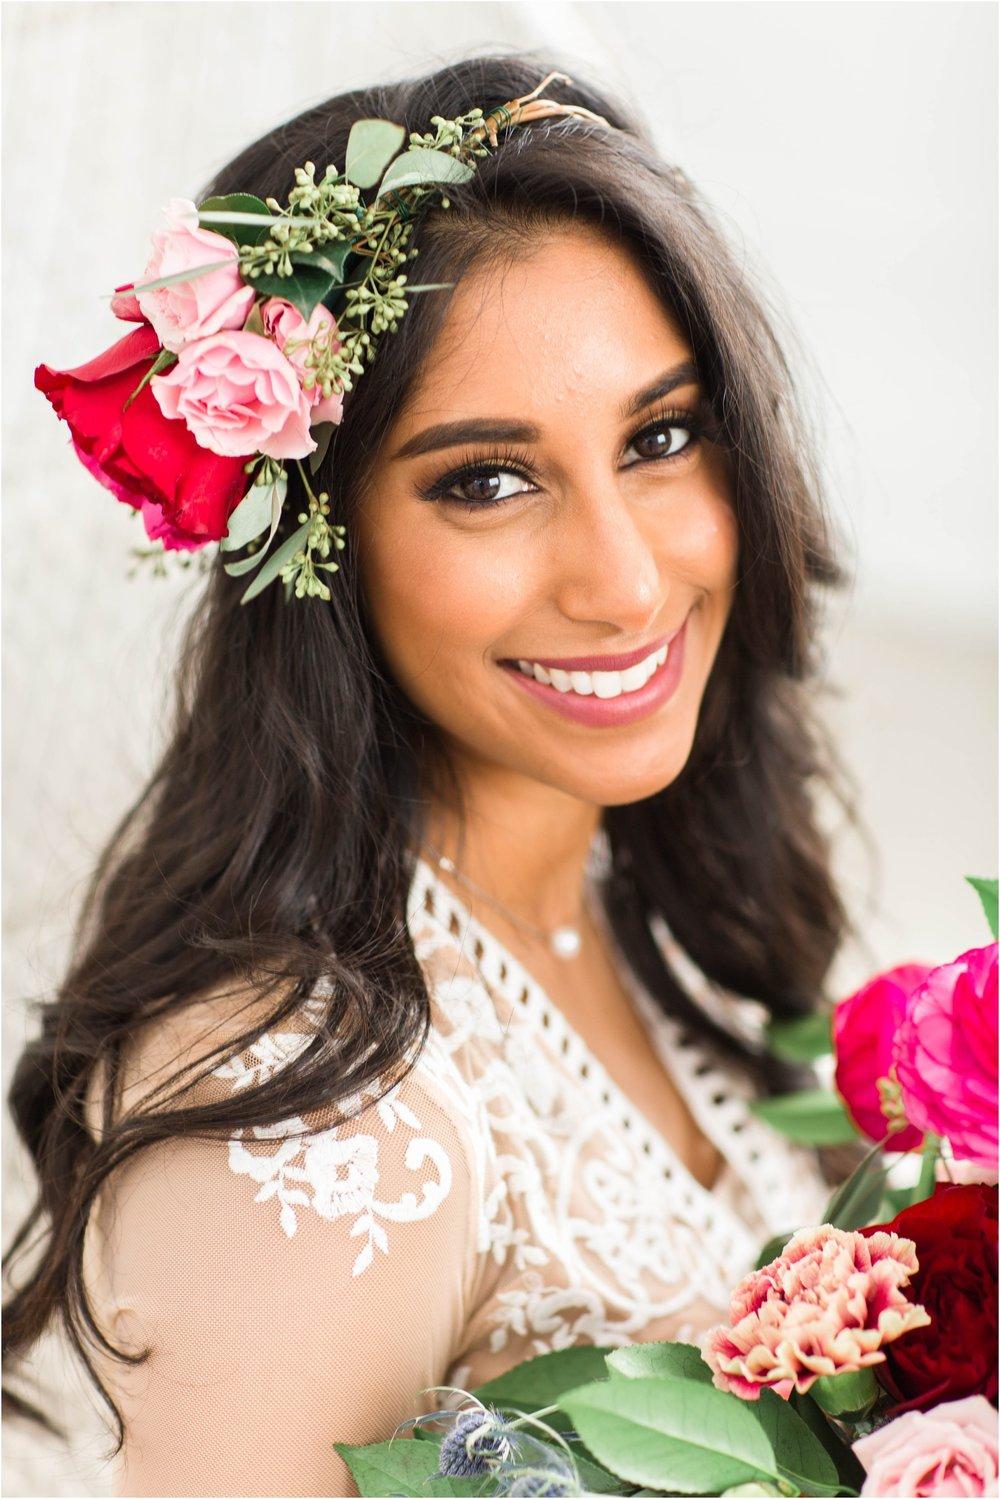 Mint-Room-Studios-Anniversary-Session-Toronto-Mississauga-Brampton-Scarborough-GTA-Pakistani-Indian-Wedding-Engagement-Photographer-Photography_0027.jpg